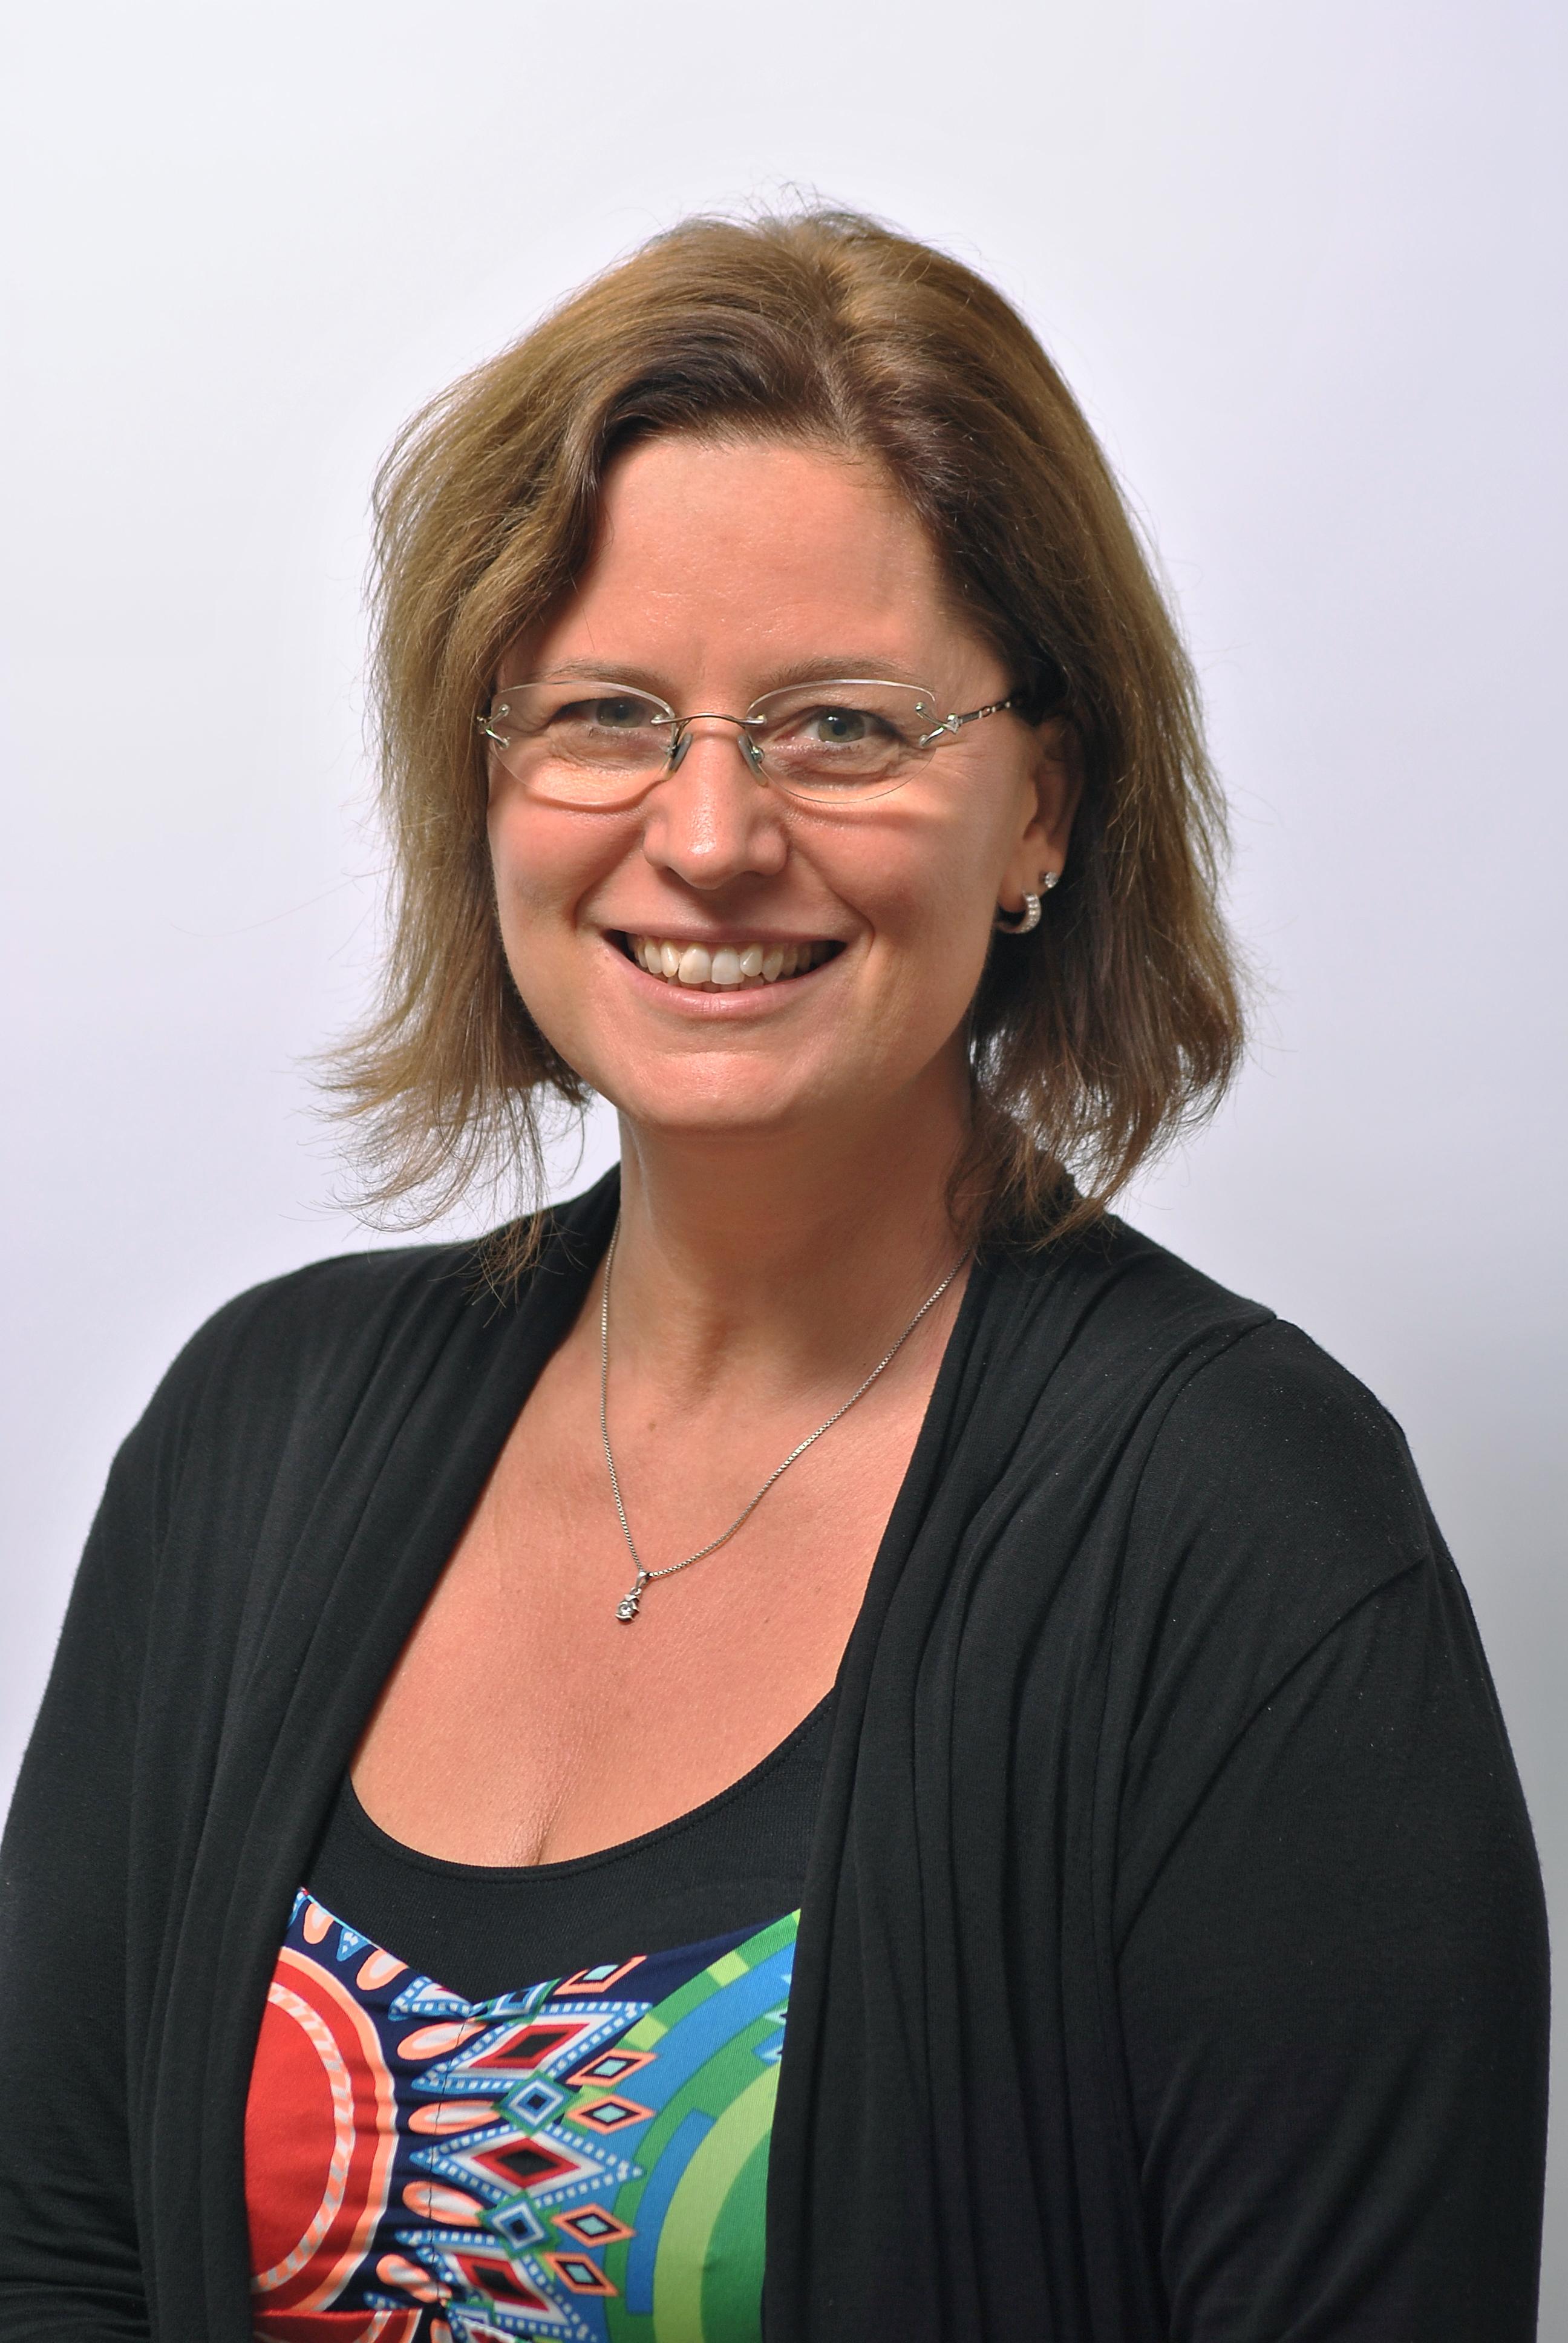 Karaszi Katalin